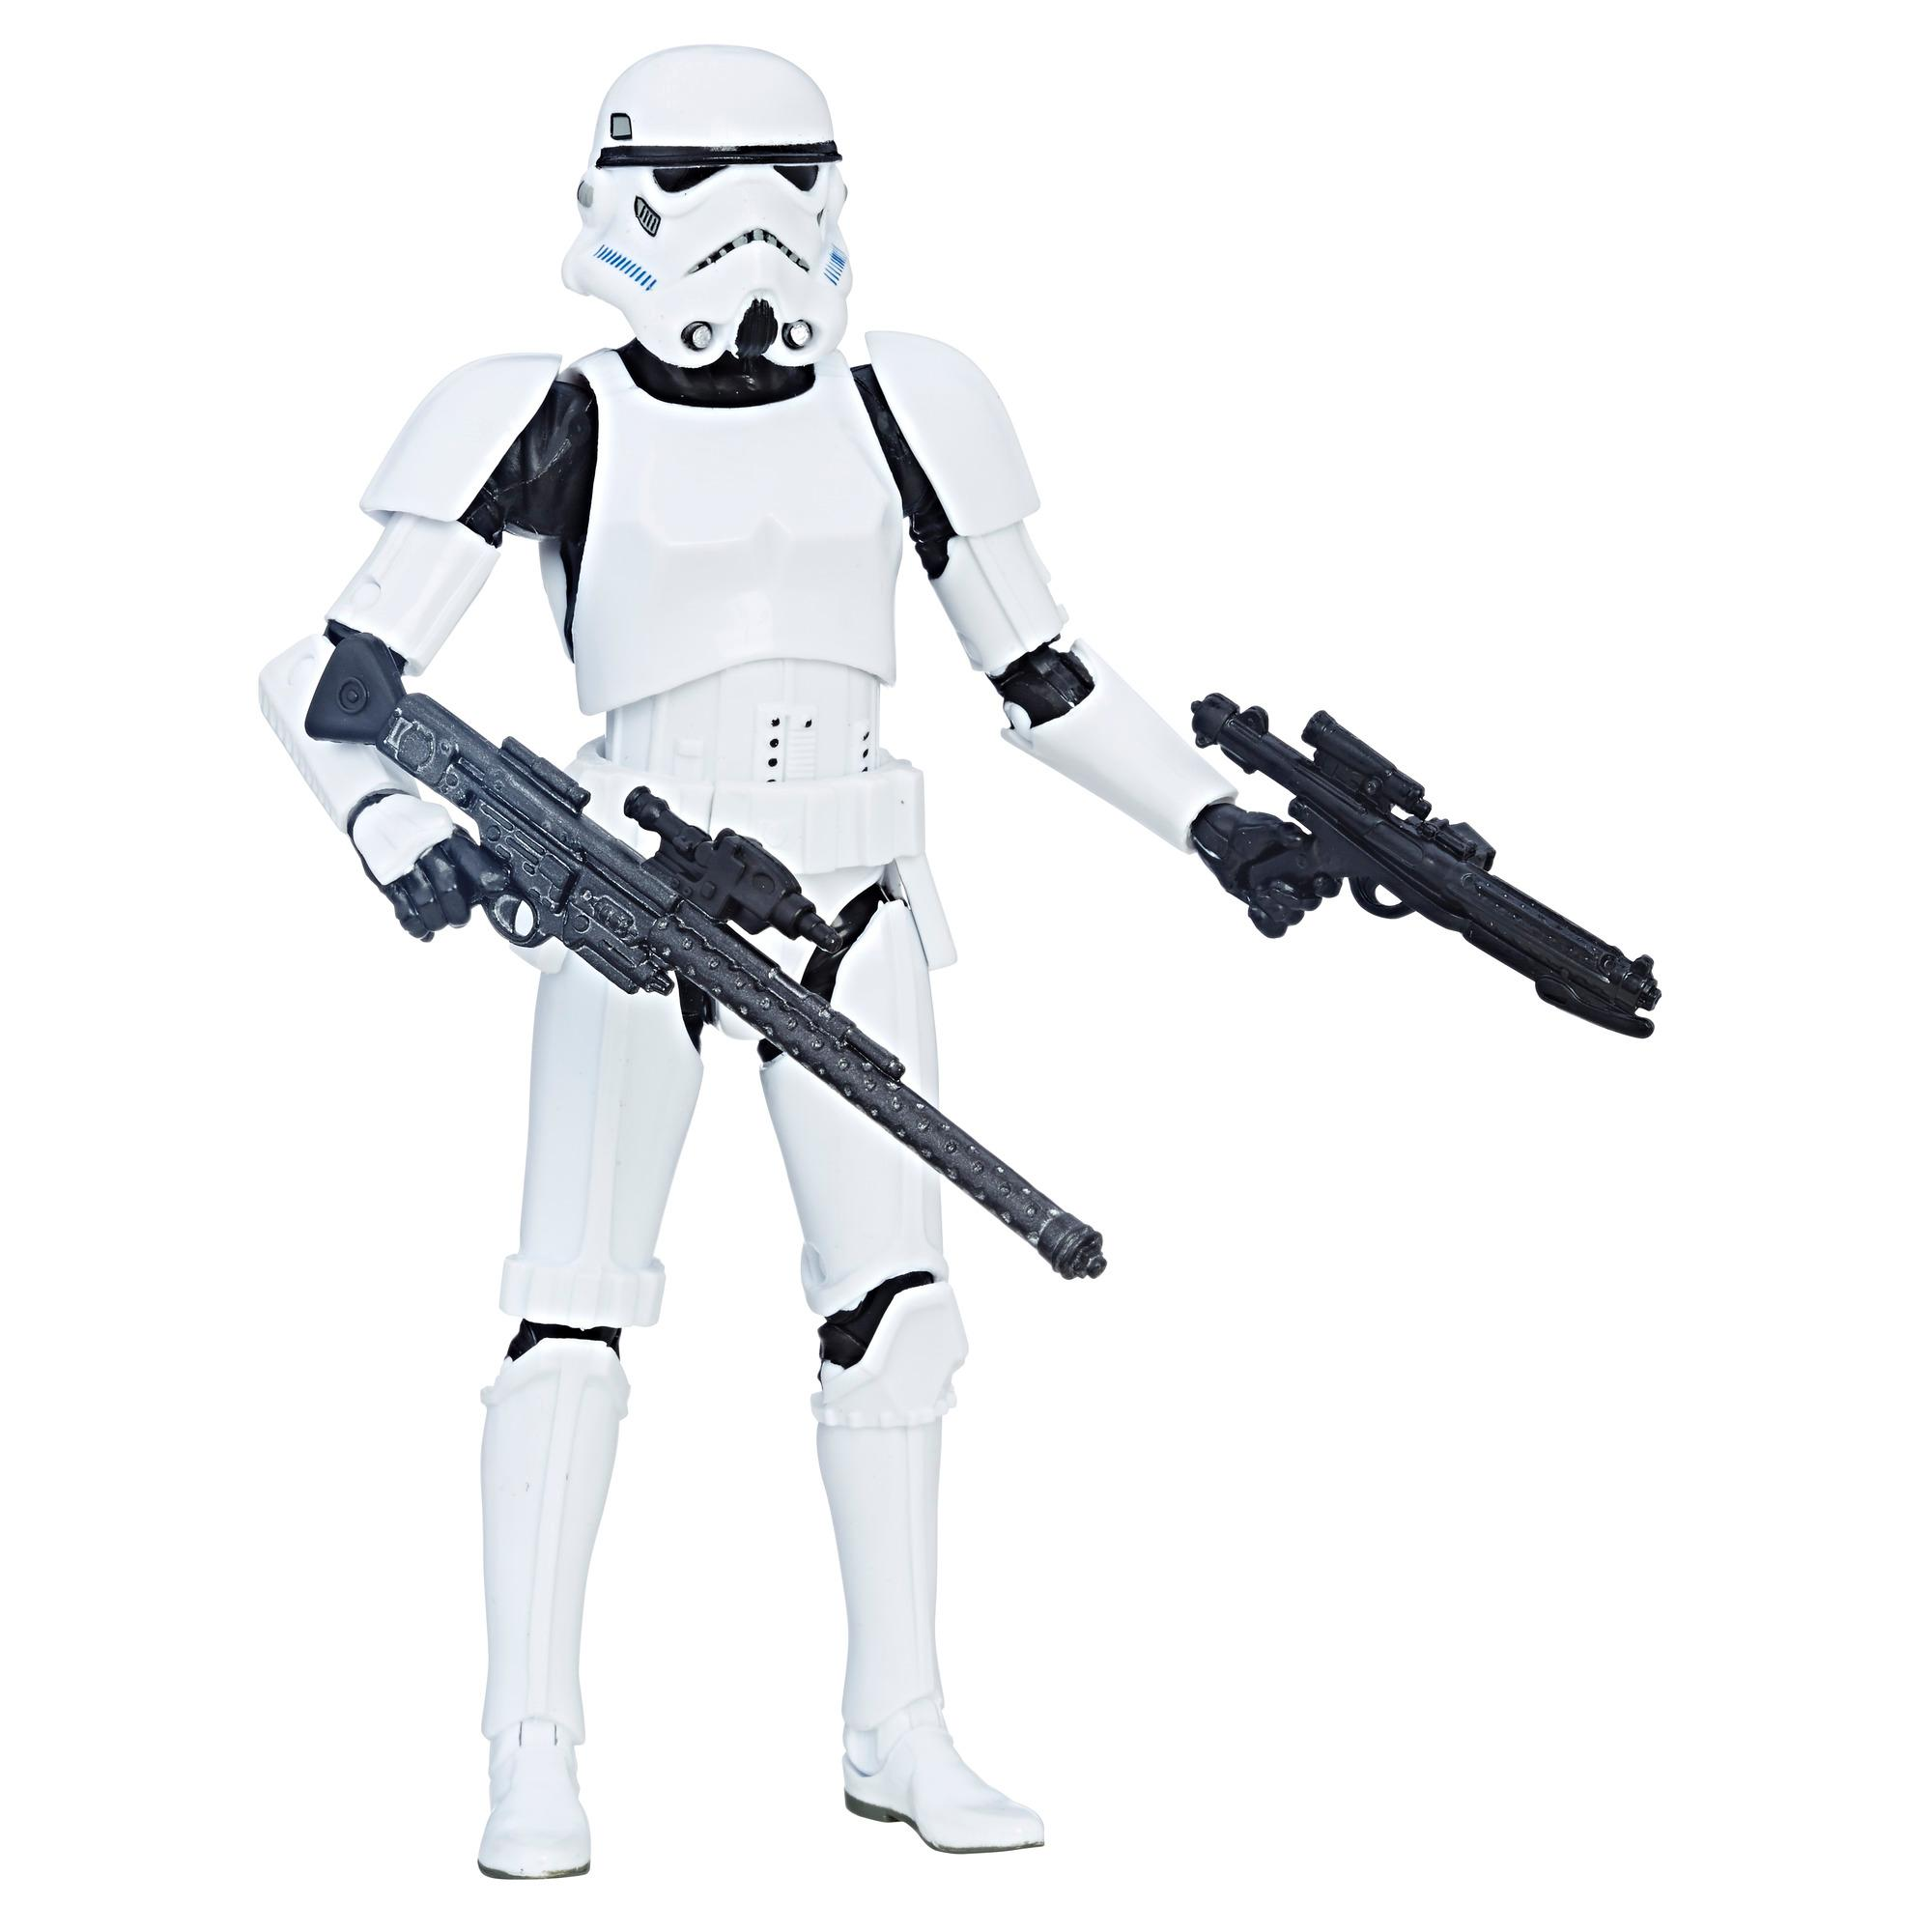 Star Wars The Black Series 40th Anniversary Stormtrooper